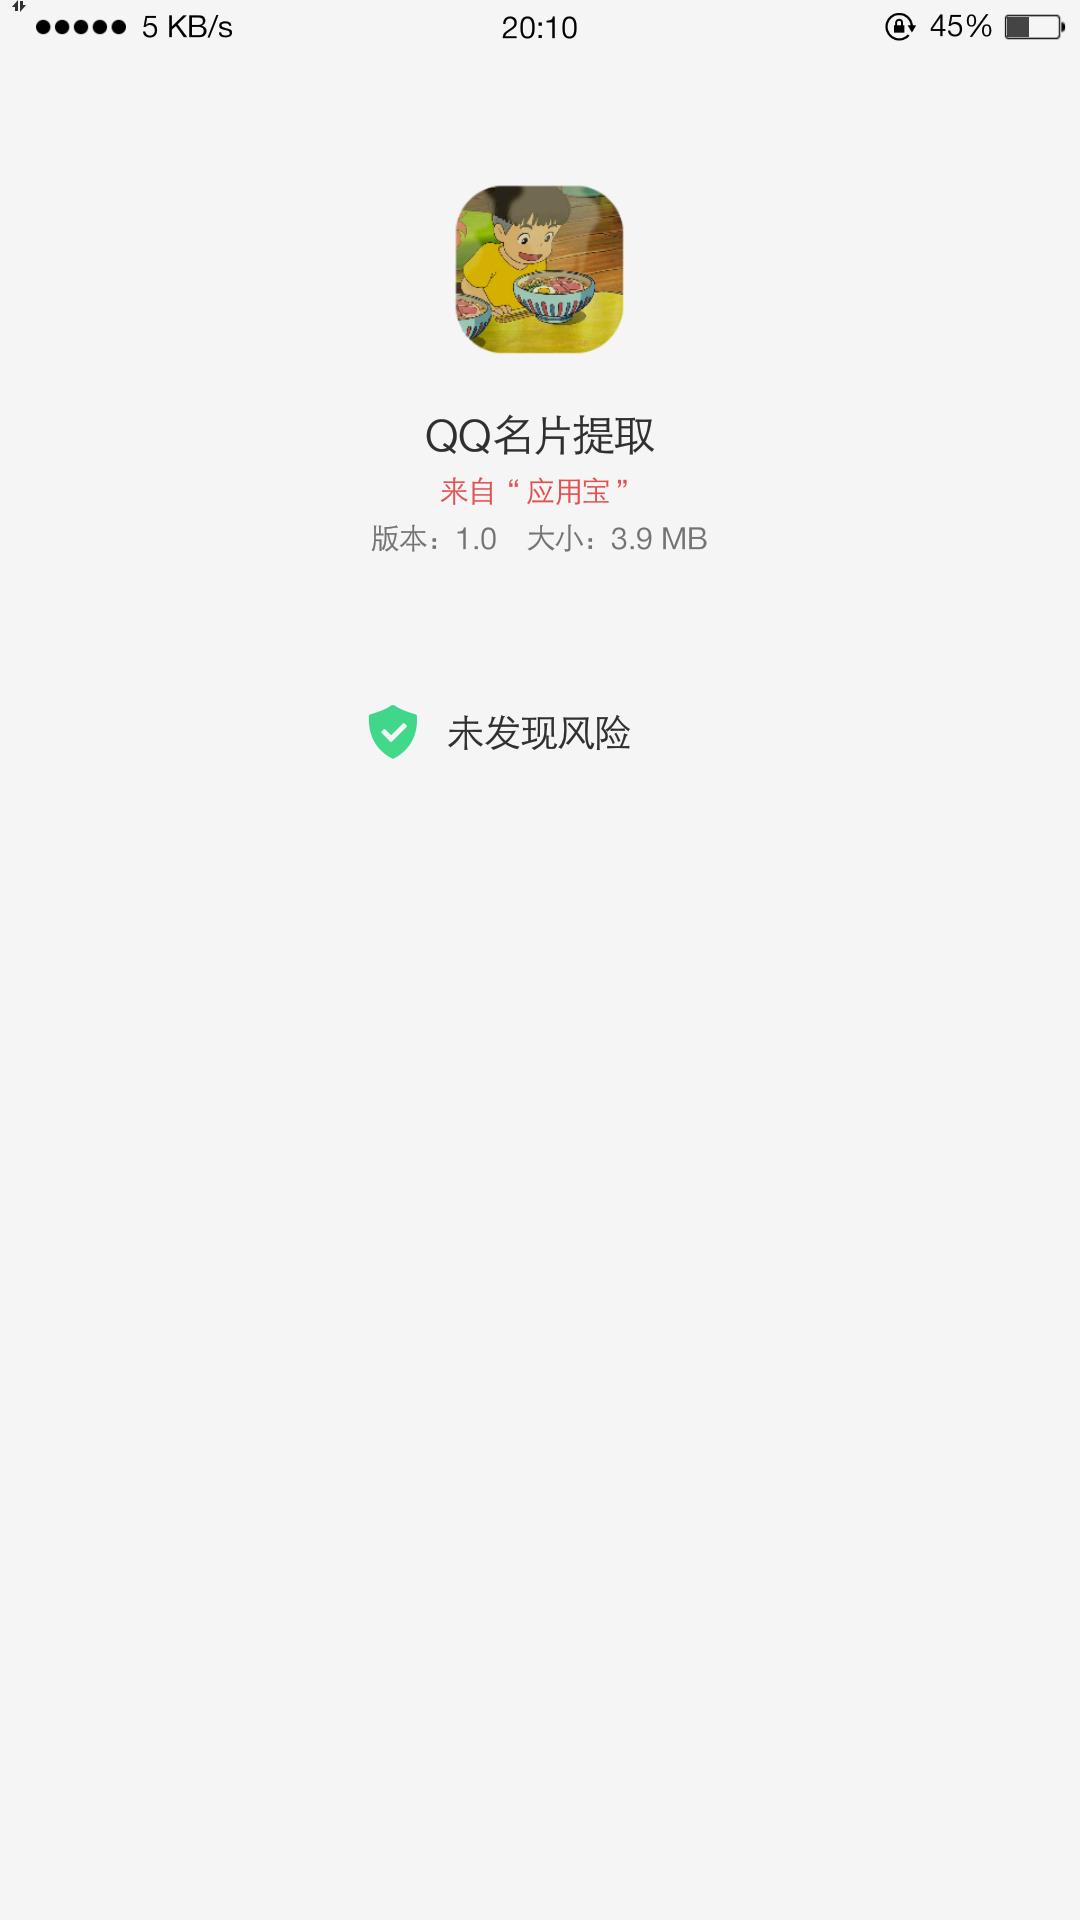 QQ名片提取保存他们的好看名片